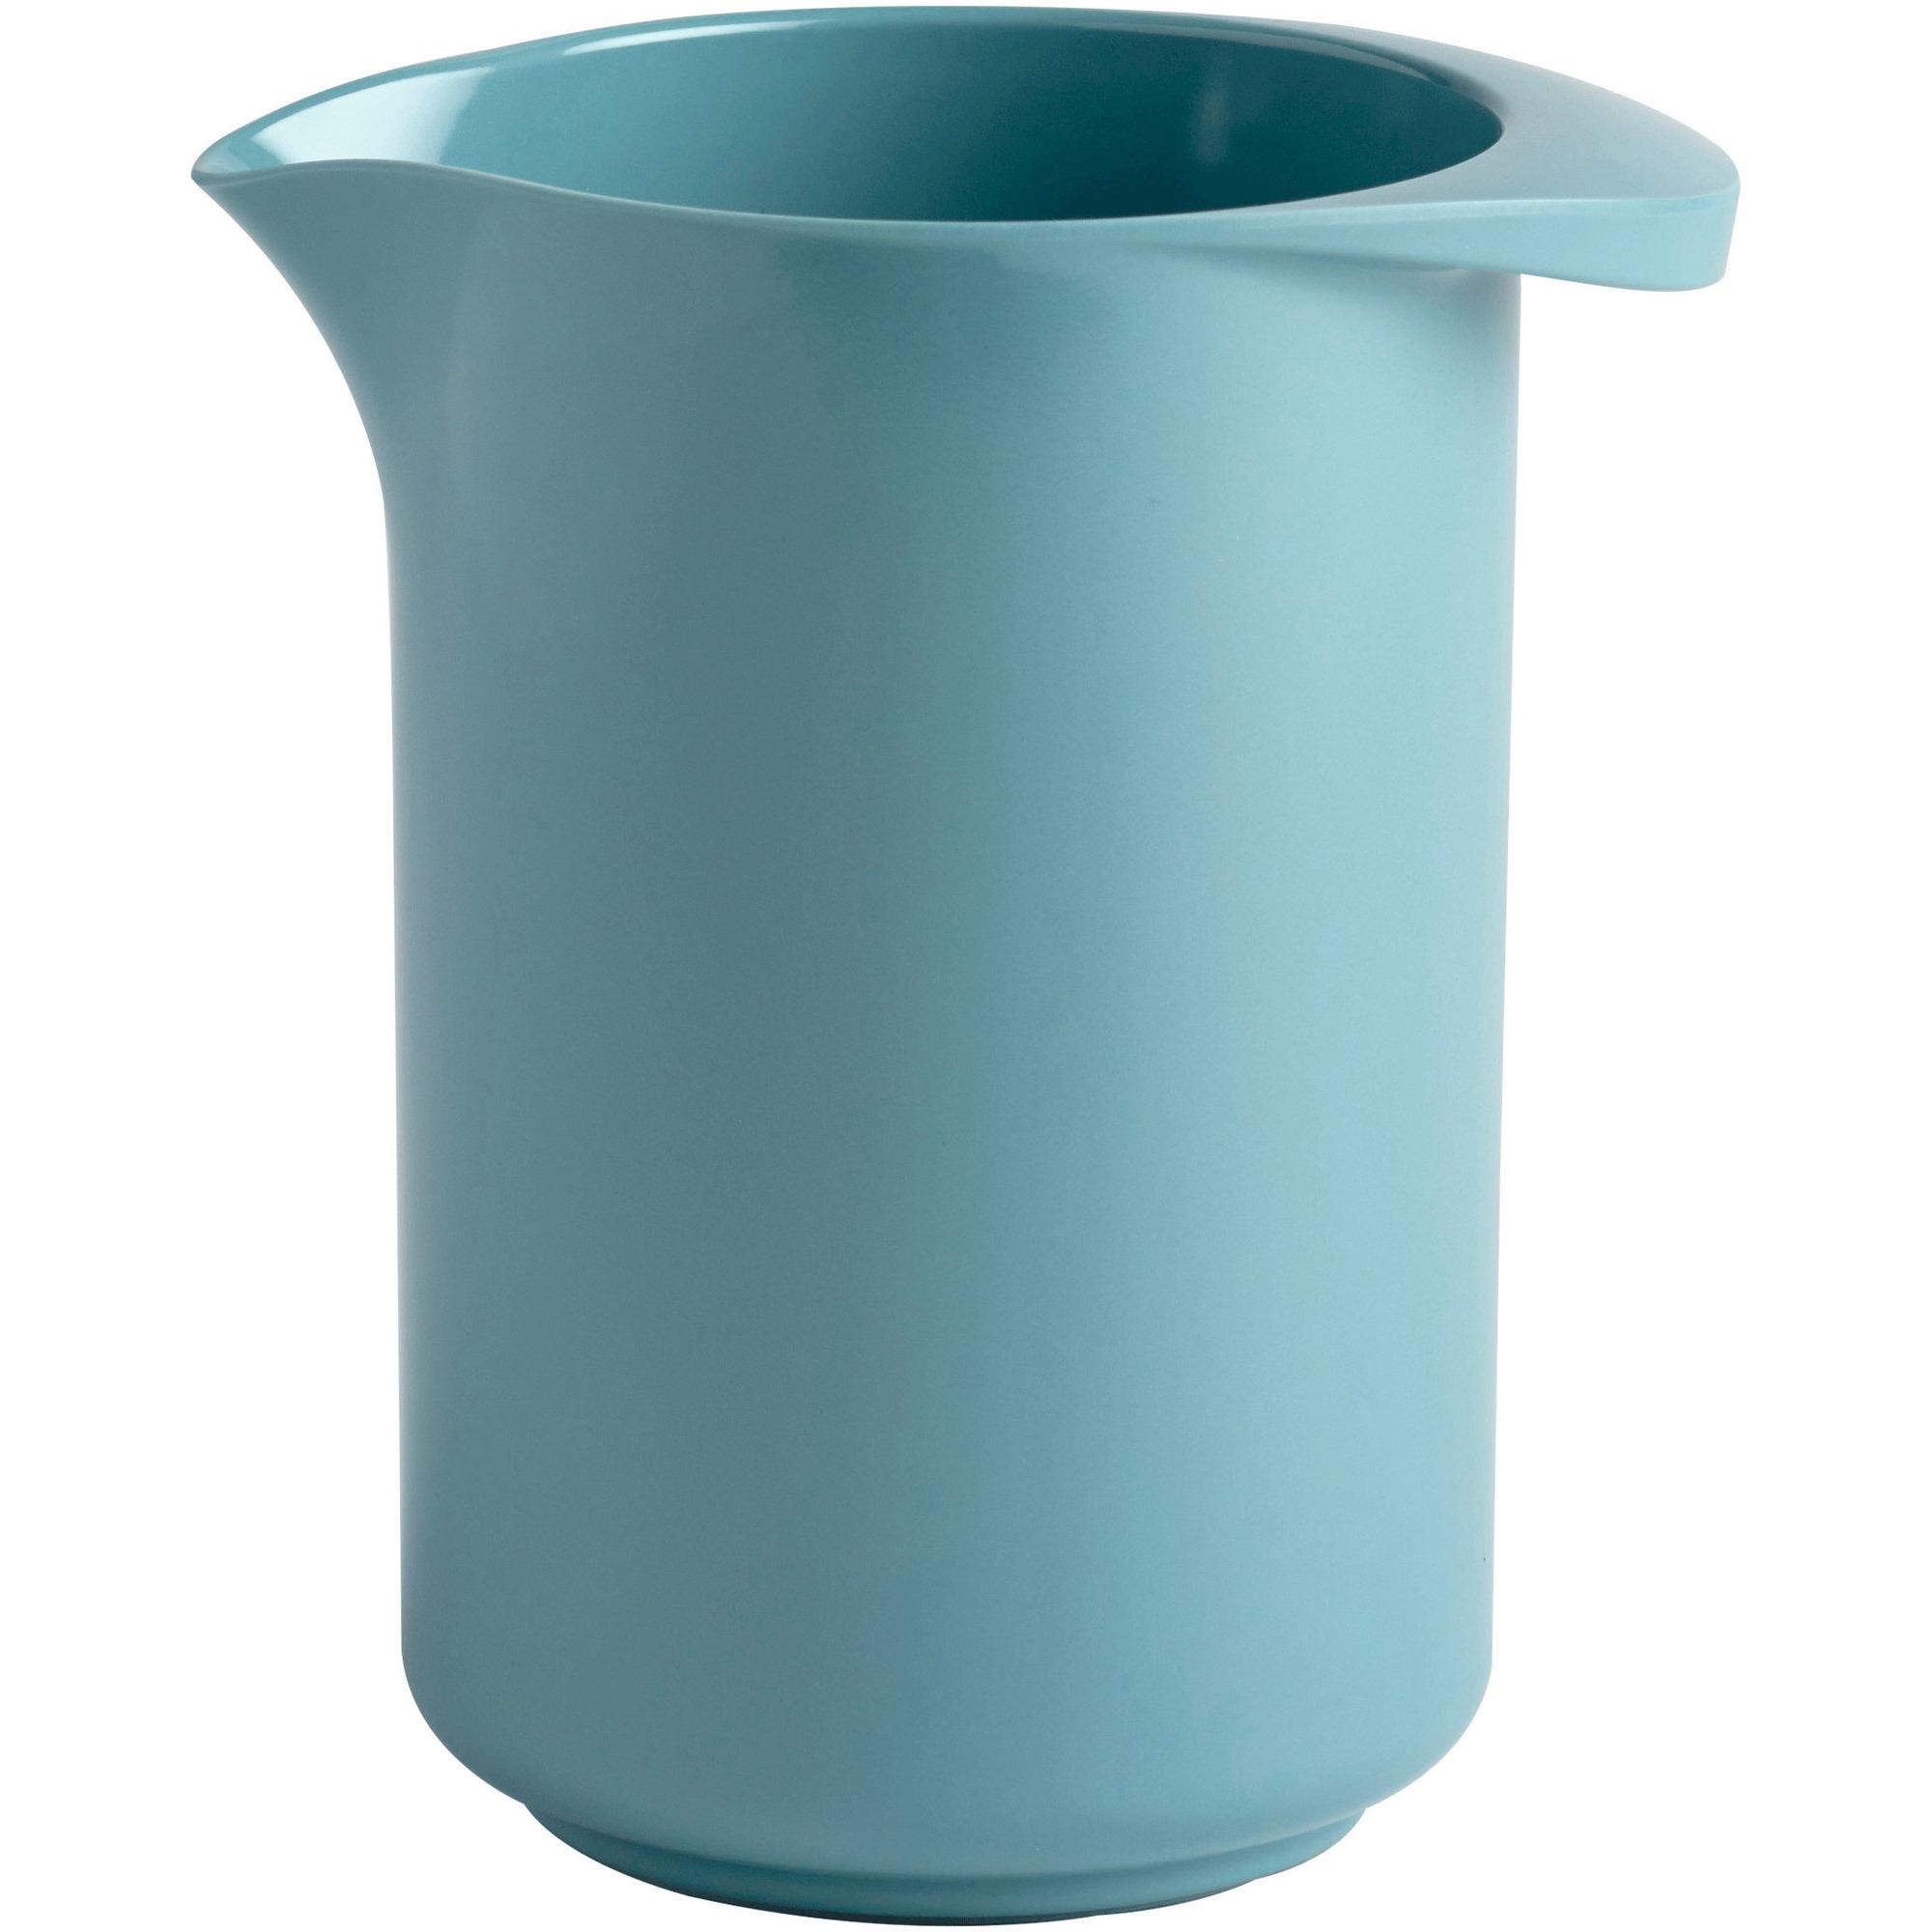 Rosti Mepal mixkanna 05 liter (Nordic Green)